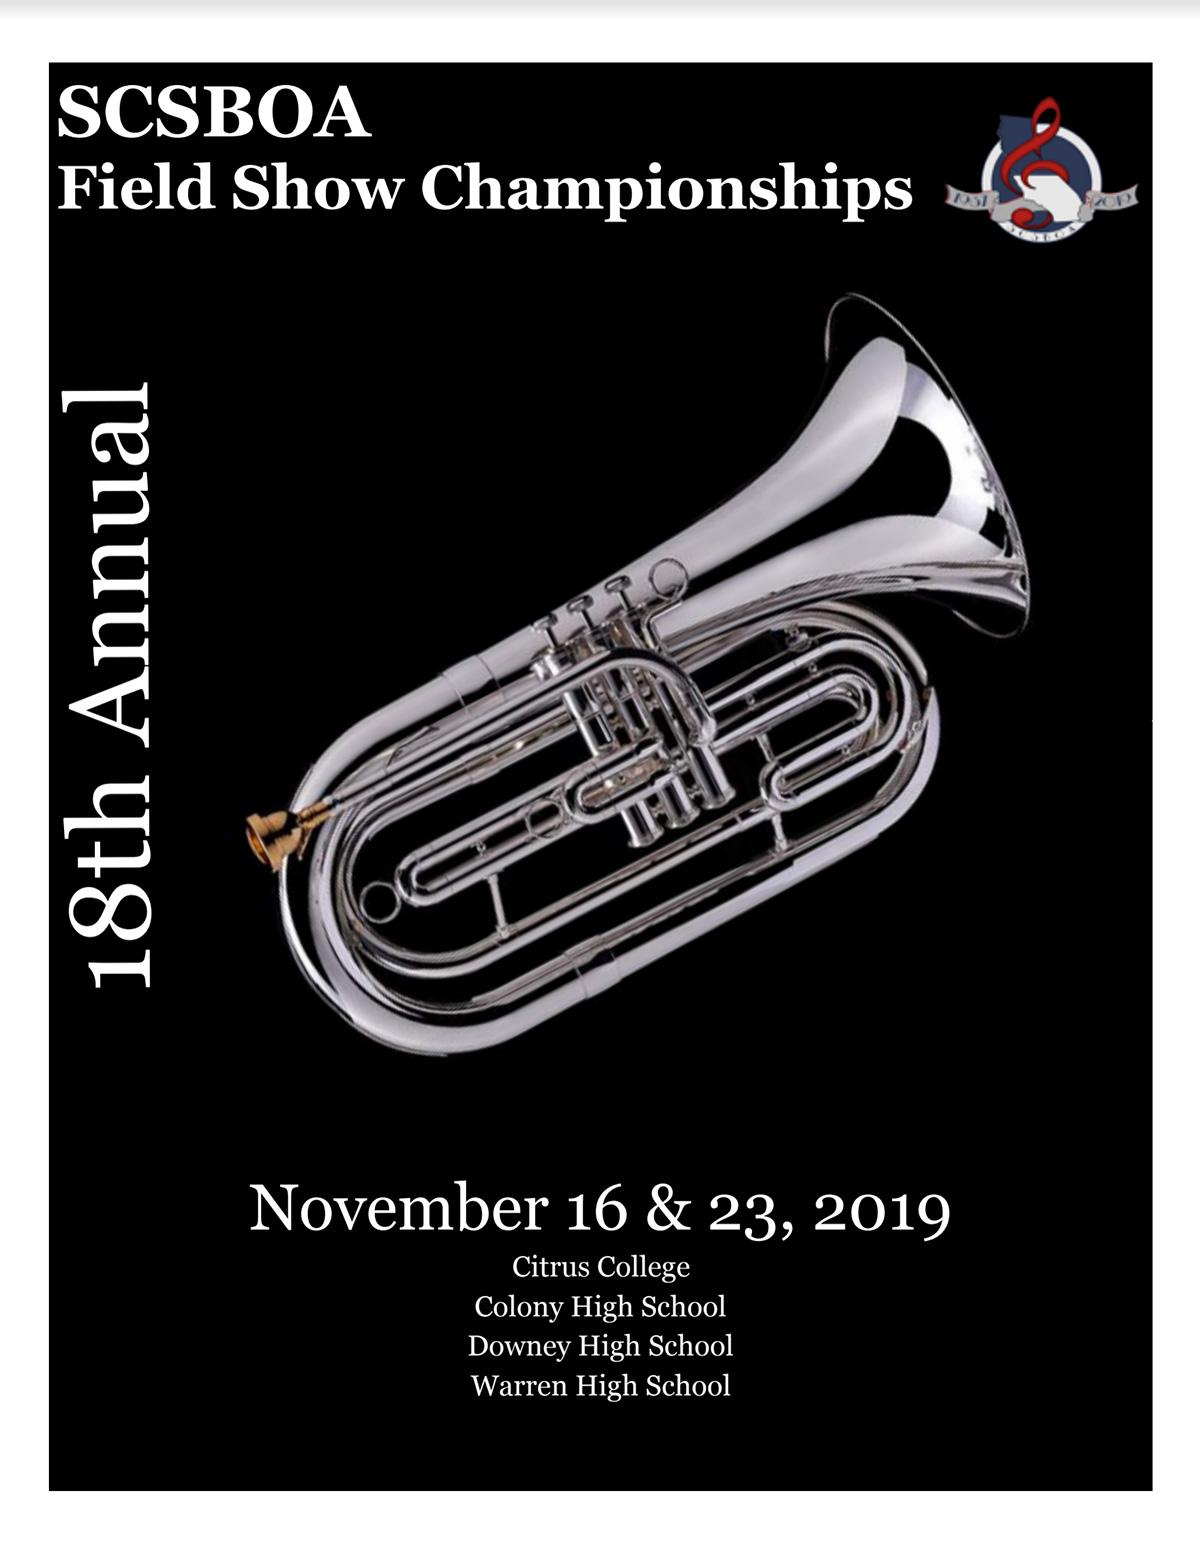 SCSBOA Field Show Championships Program 2019